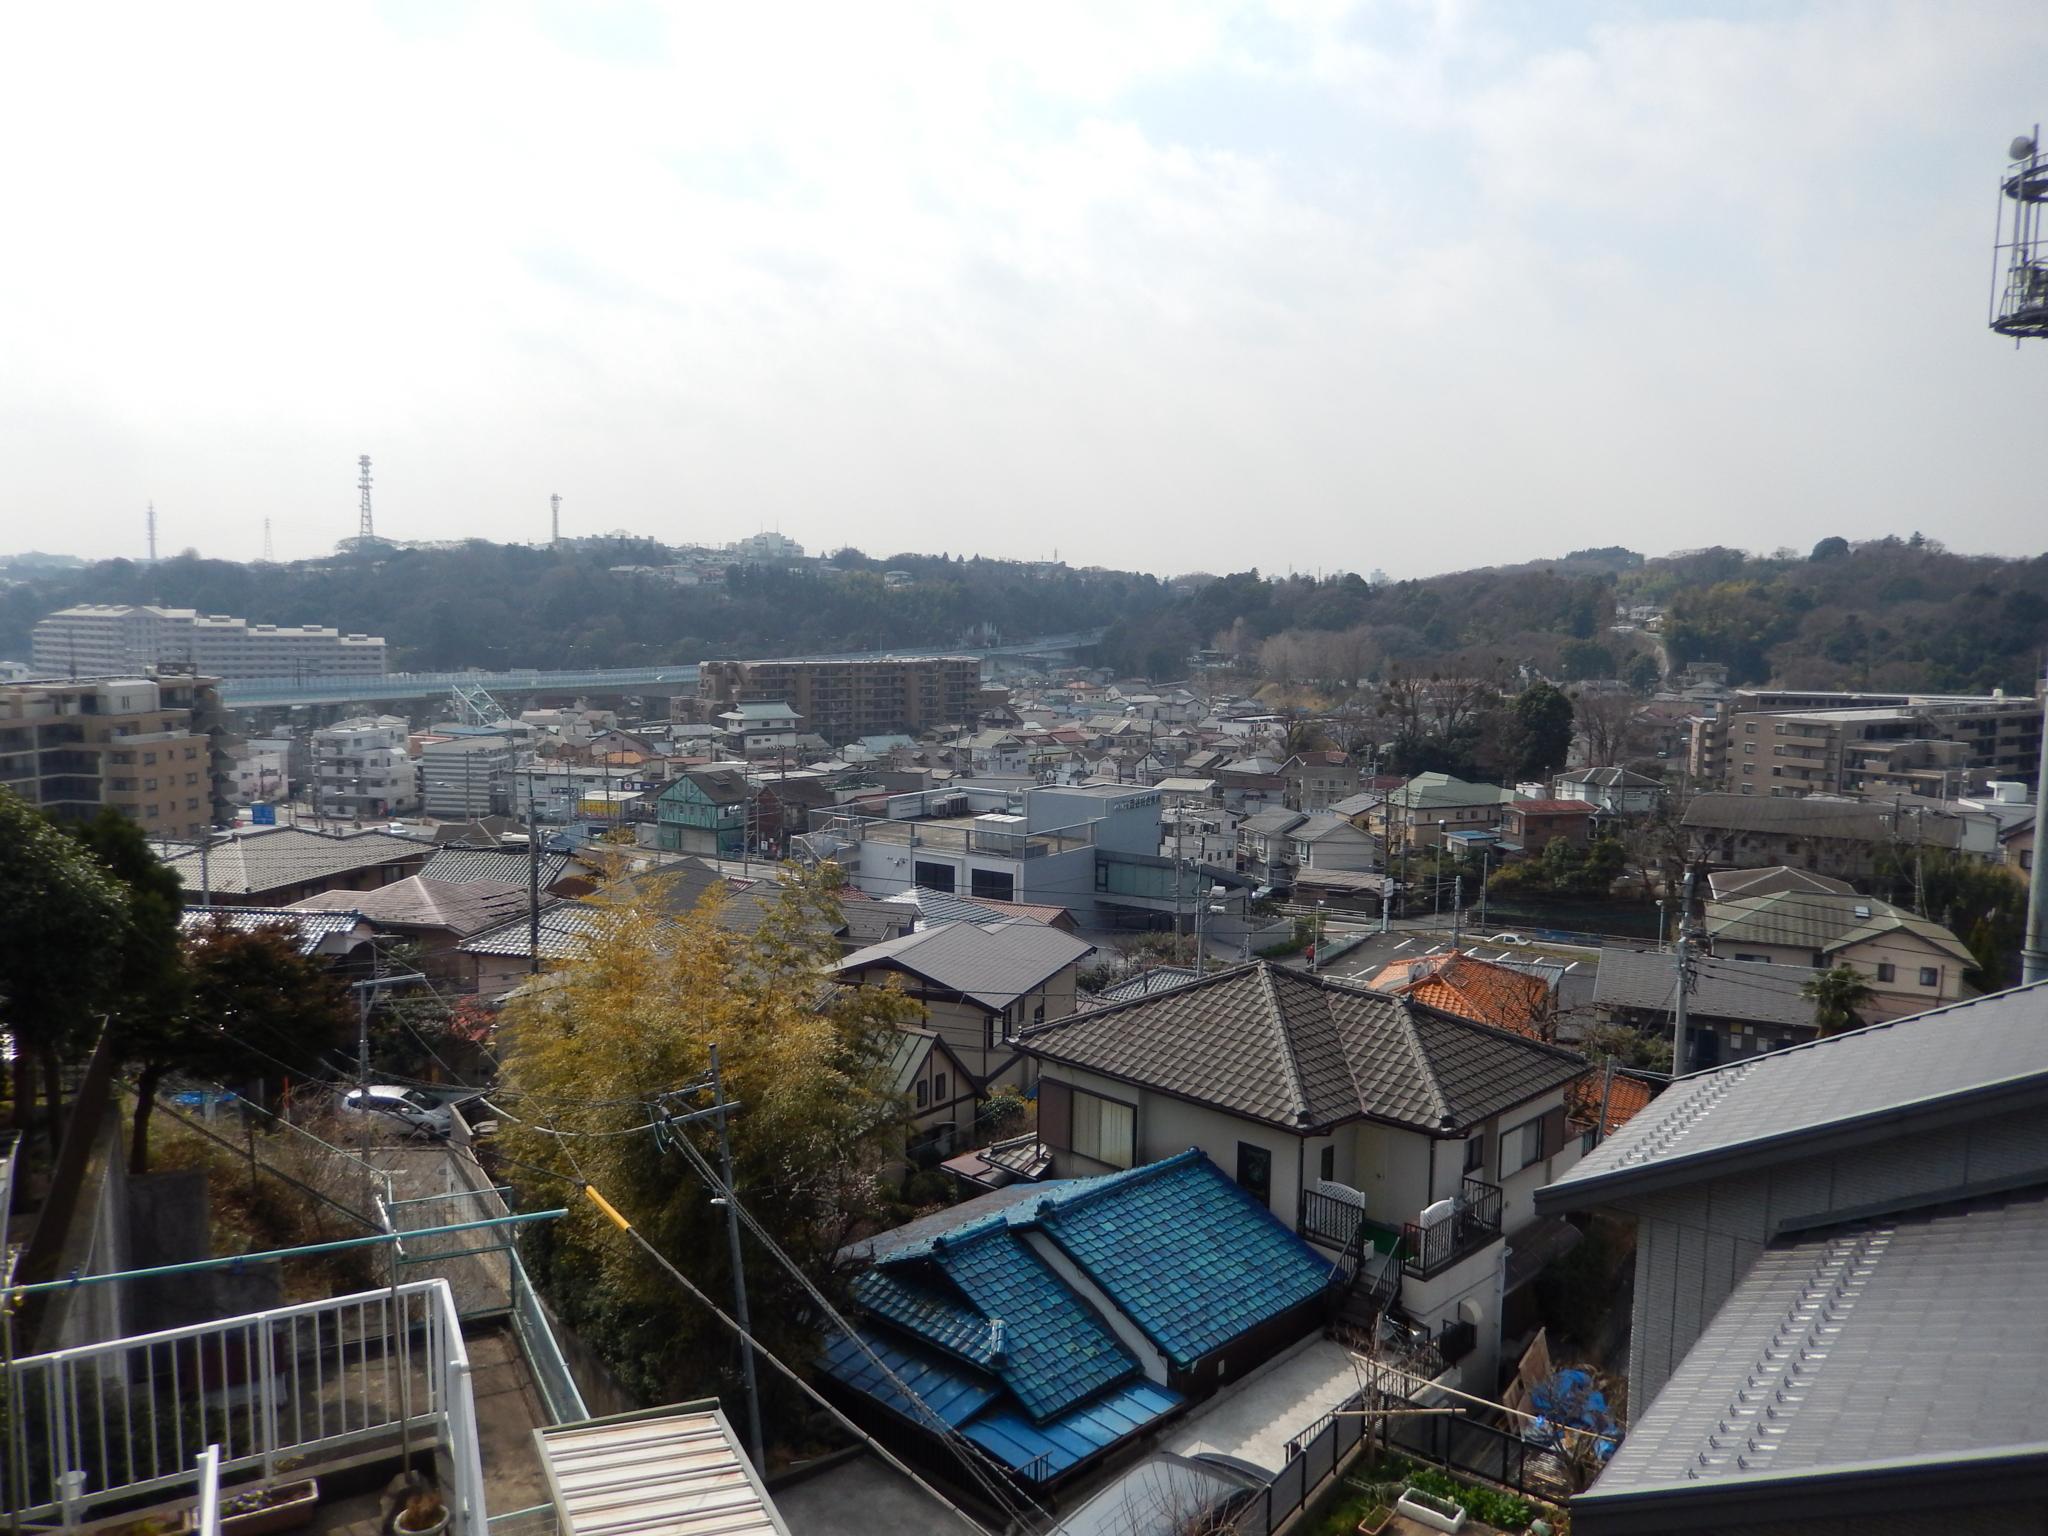 f:id:ToshUeno:20160305110753j:plain